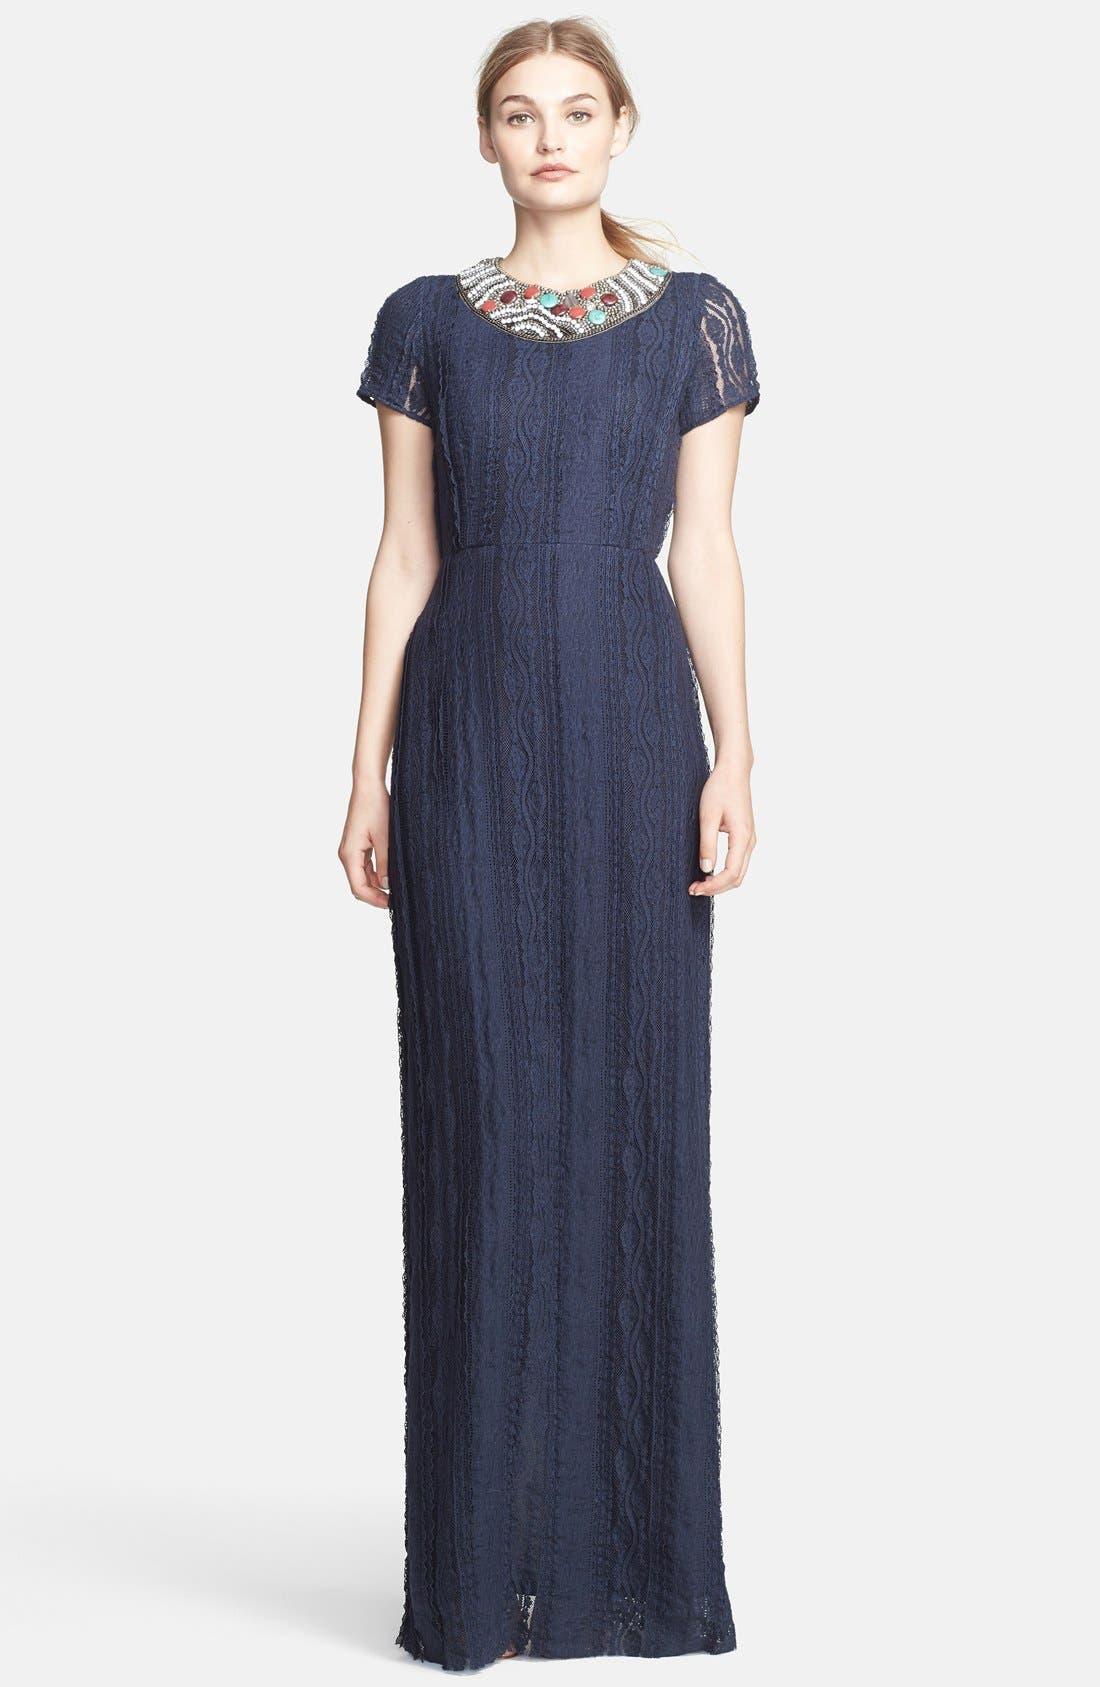 Alternate Image 1 Selected - Korovilas 'Georgia' Encrusted Neck Lace Maxi Dress